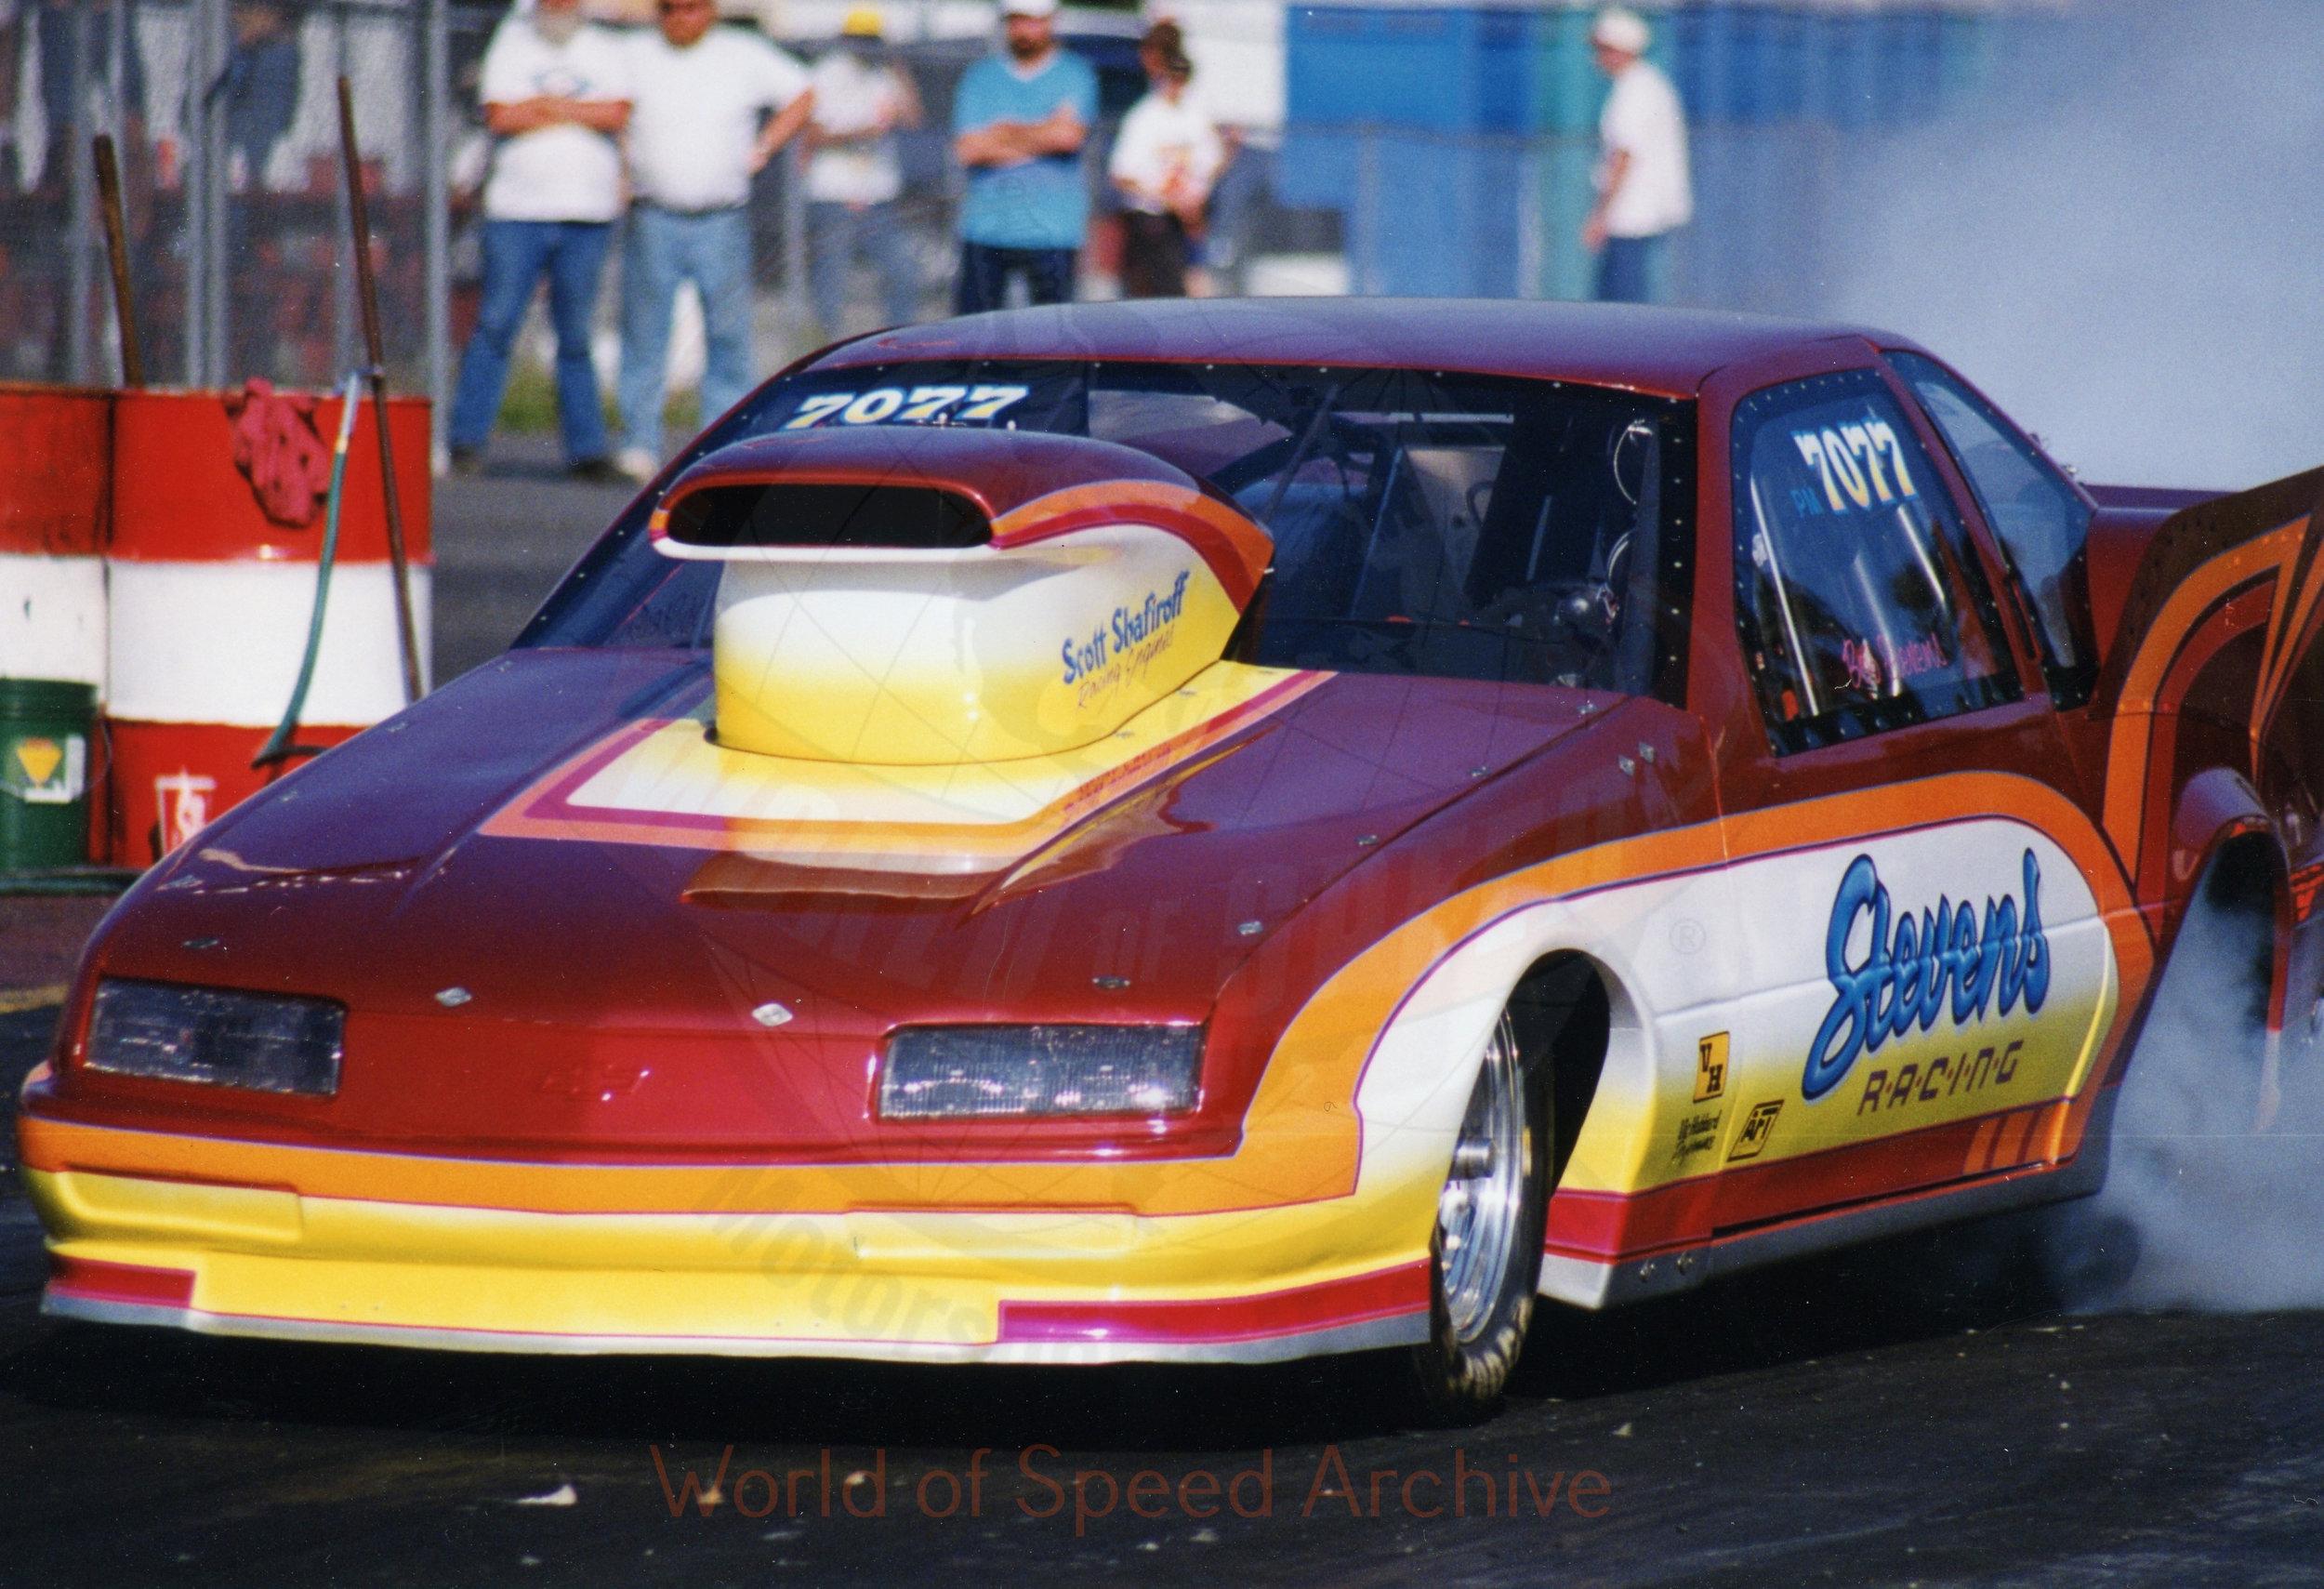 B4-S3-G1-F17-009 - Scott, Steven's Racing